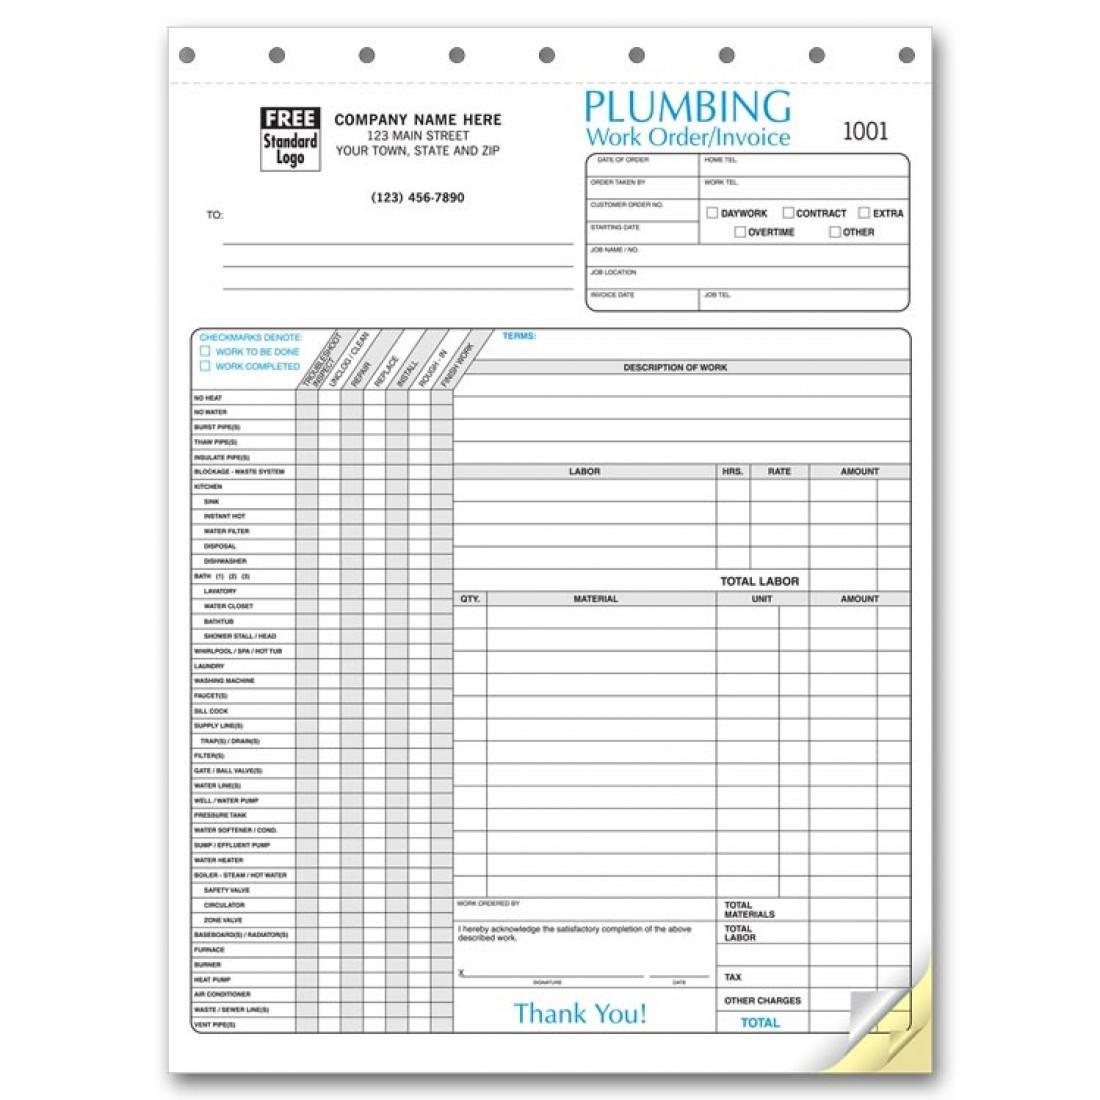 Plumbing Invoice Forms At Print Ez